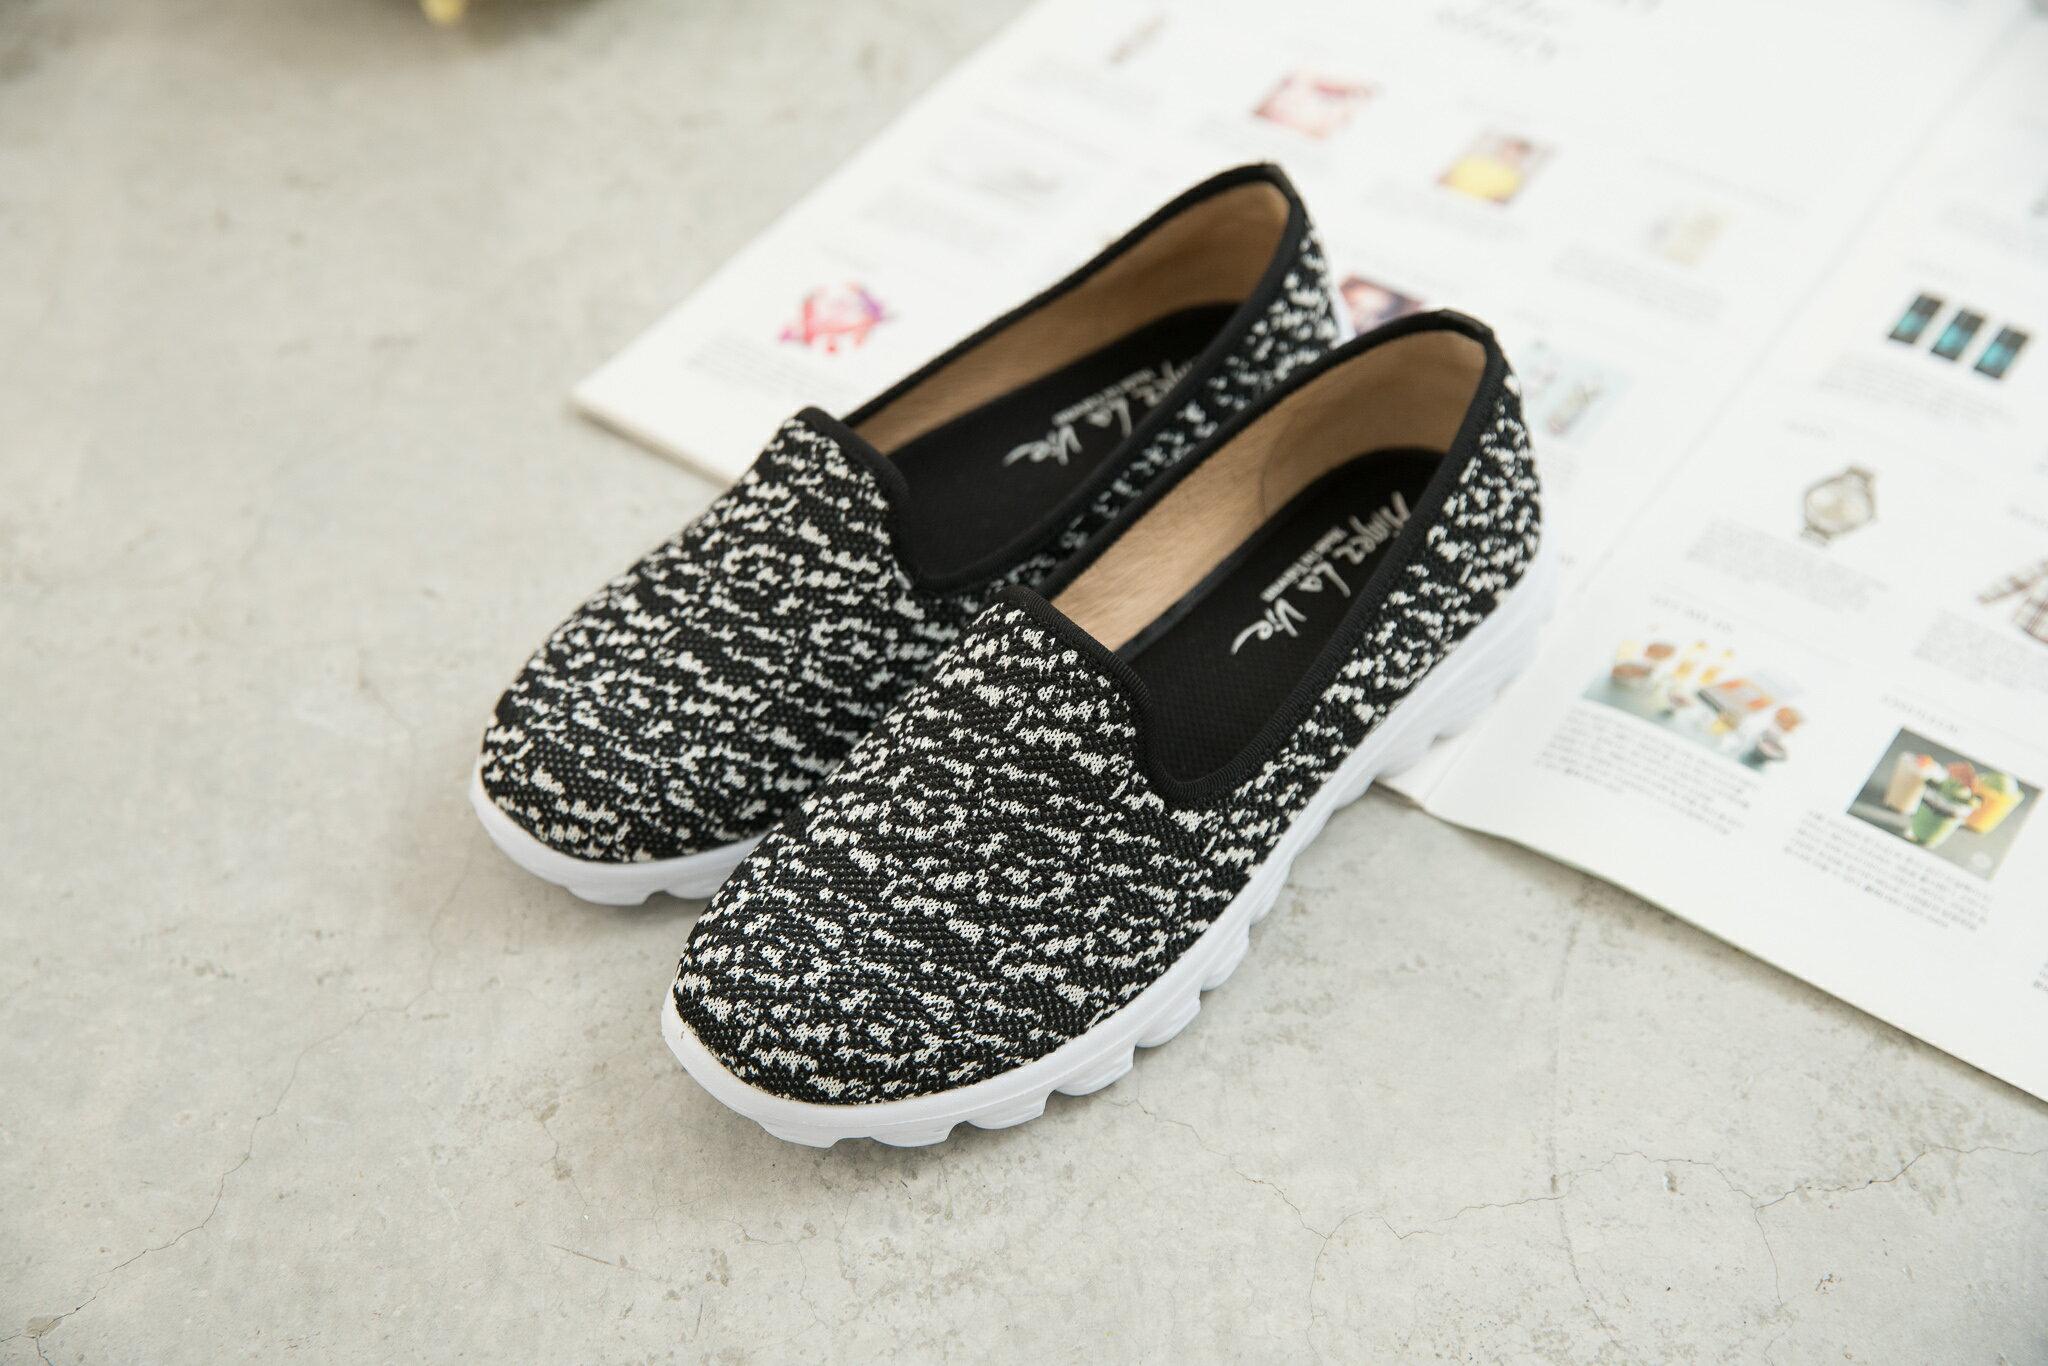 Aimez La Vie 輕盈健走鞋|黑白織布混色百搭休閒鞋 0